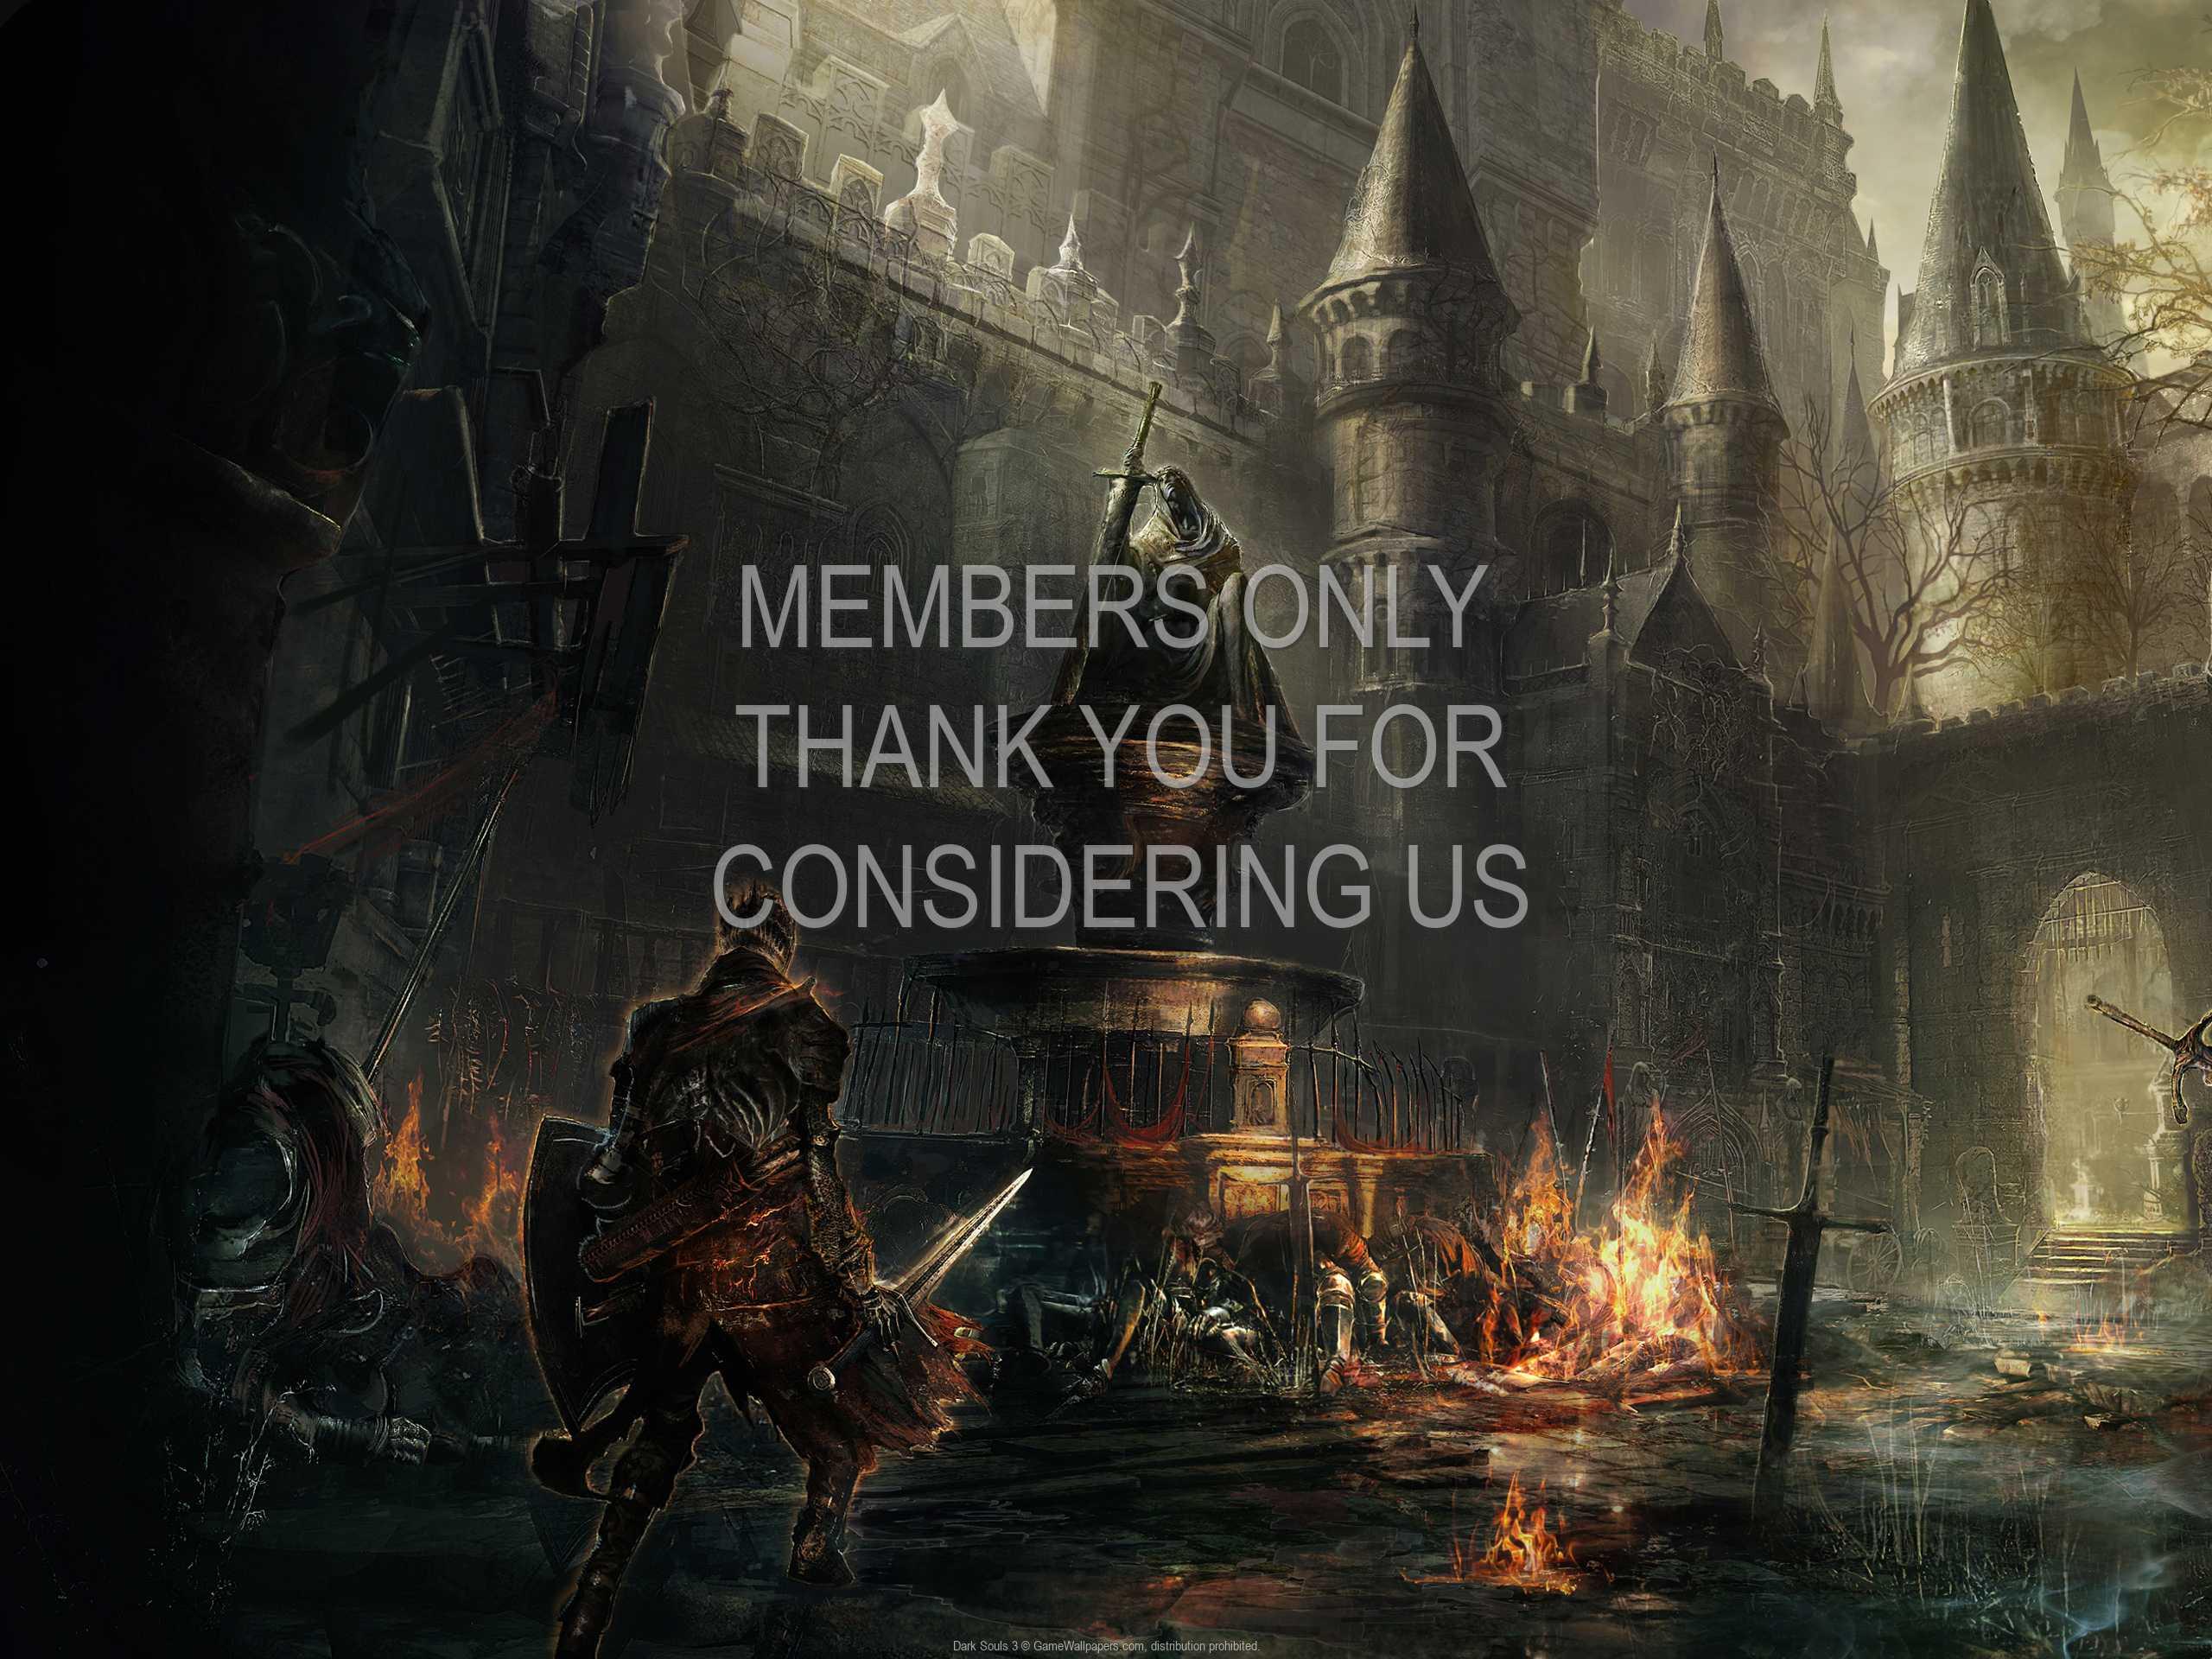 Dark Souls 3 1080p Horizontal Handy Hintergrundbild 01